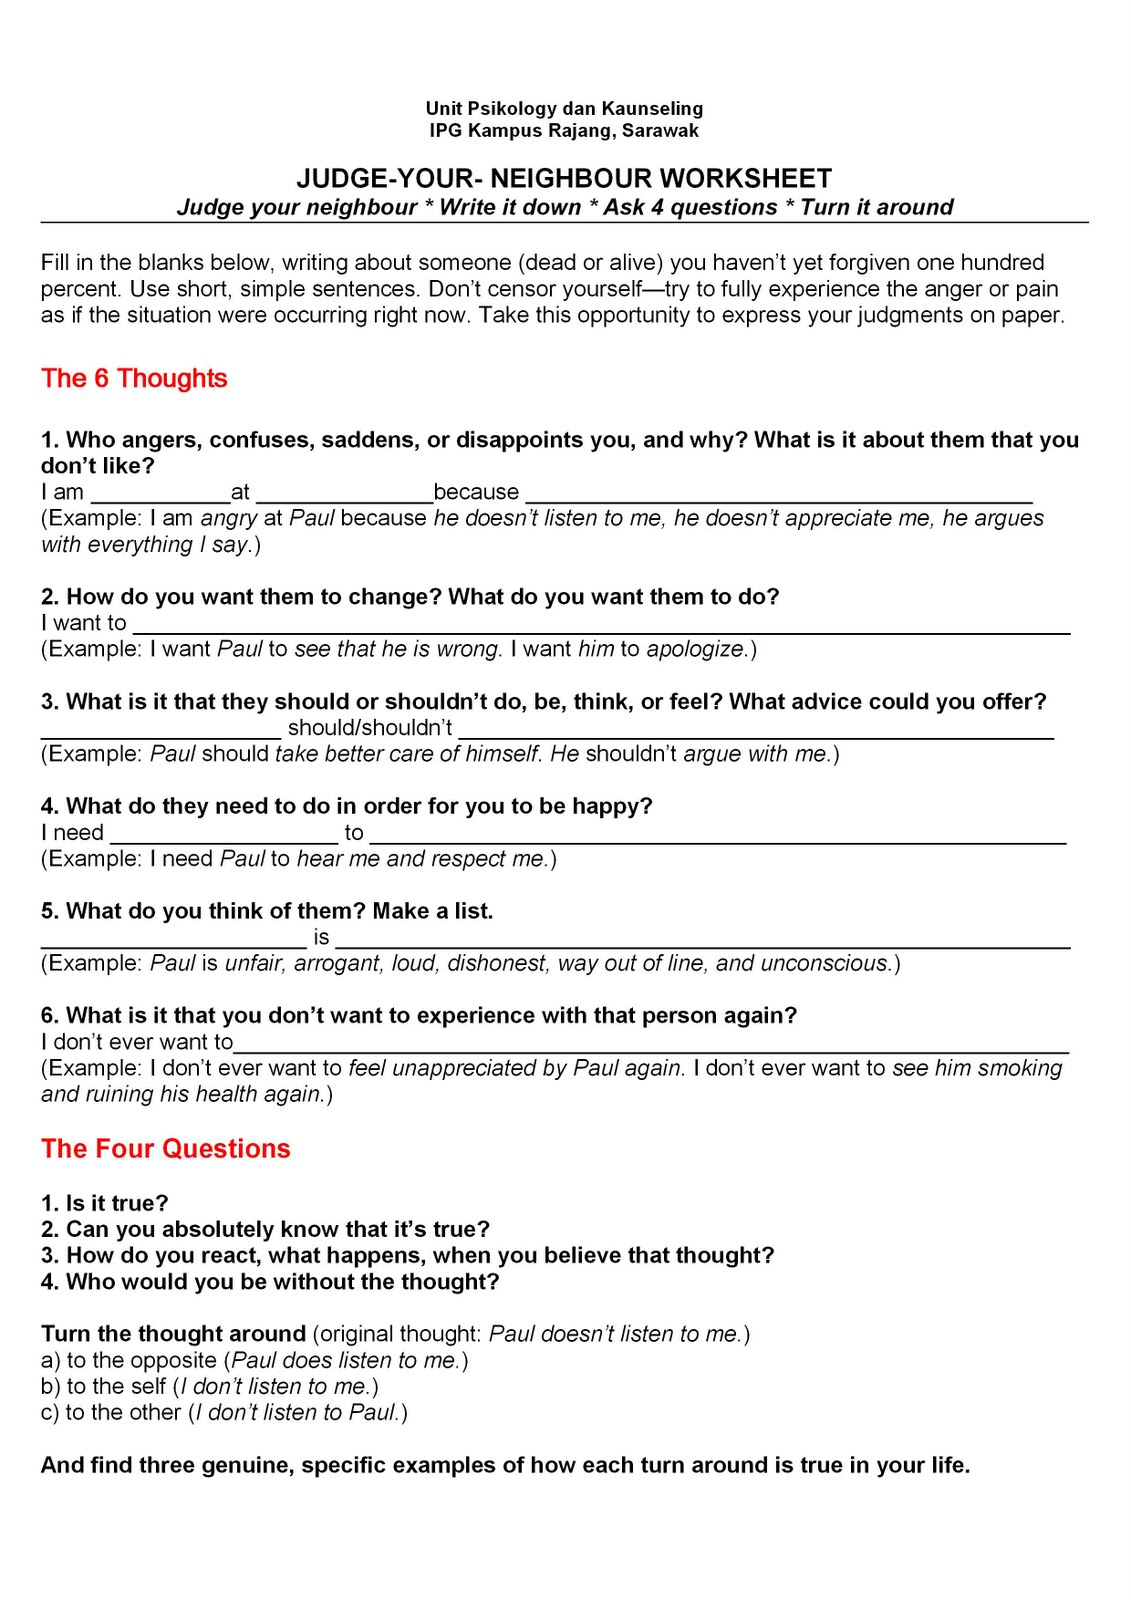 Is It True Byron Katie Worksheet Printable Worksheets And Activities For Teachers Parents Tutors And Homeschool Families